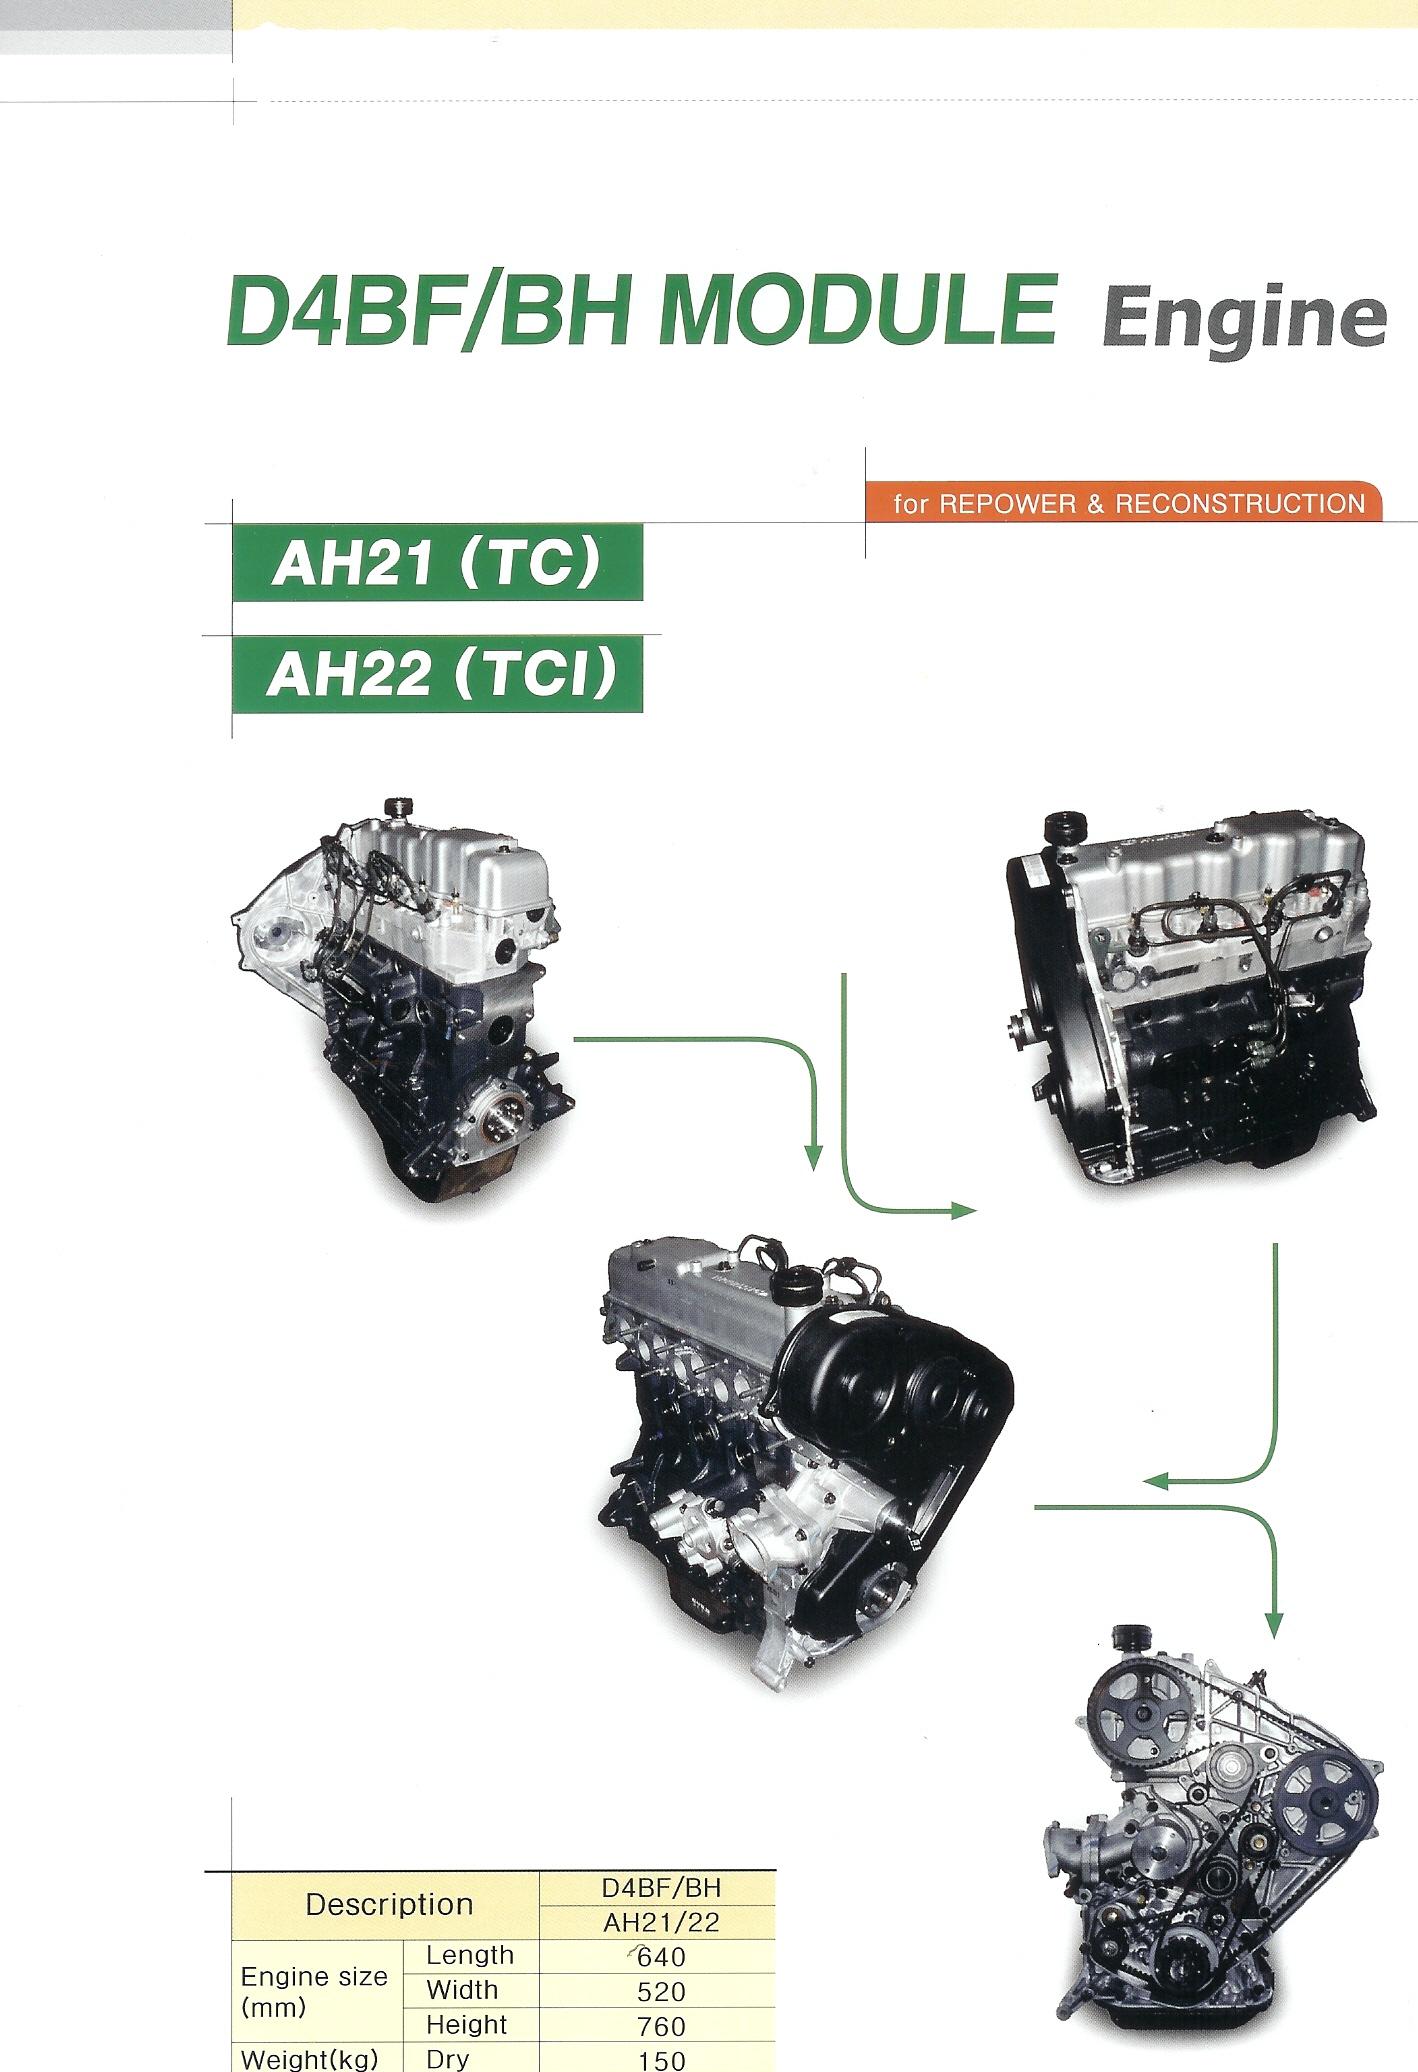 MODULE ENGINE (MODULE ENGINE)